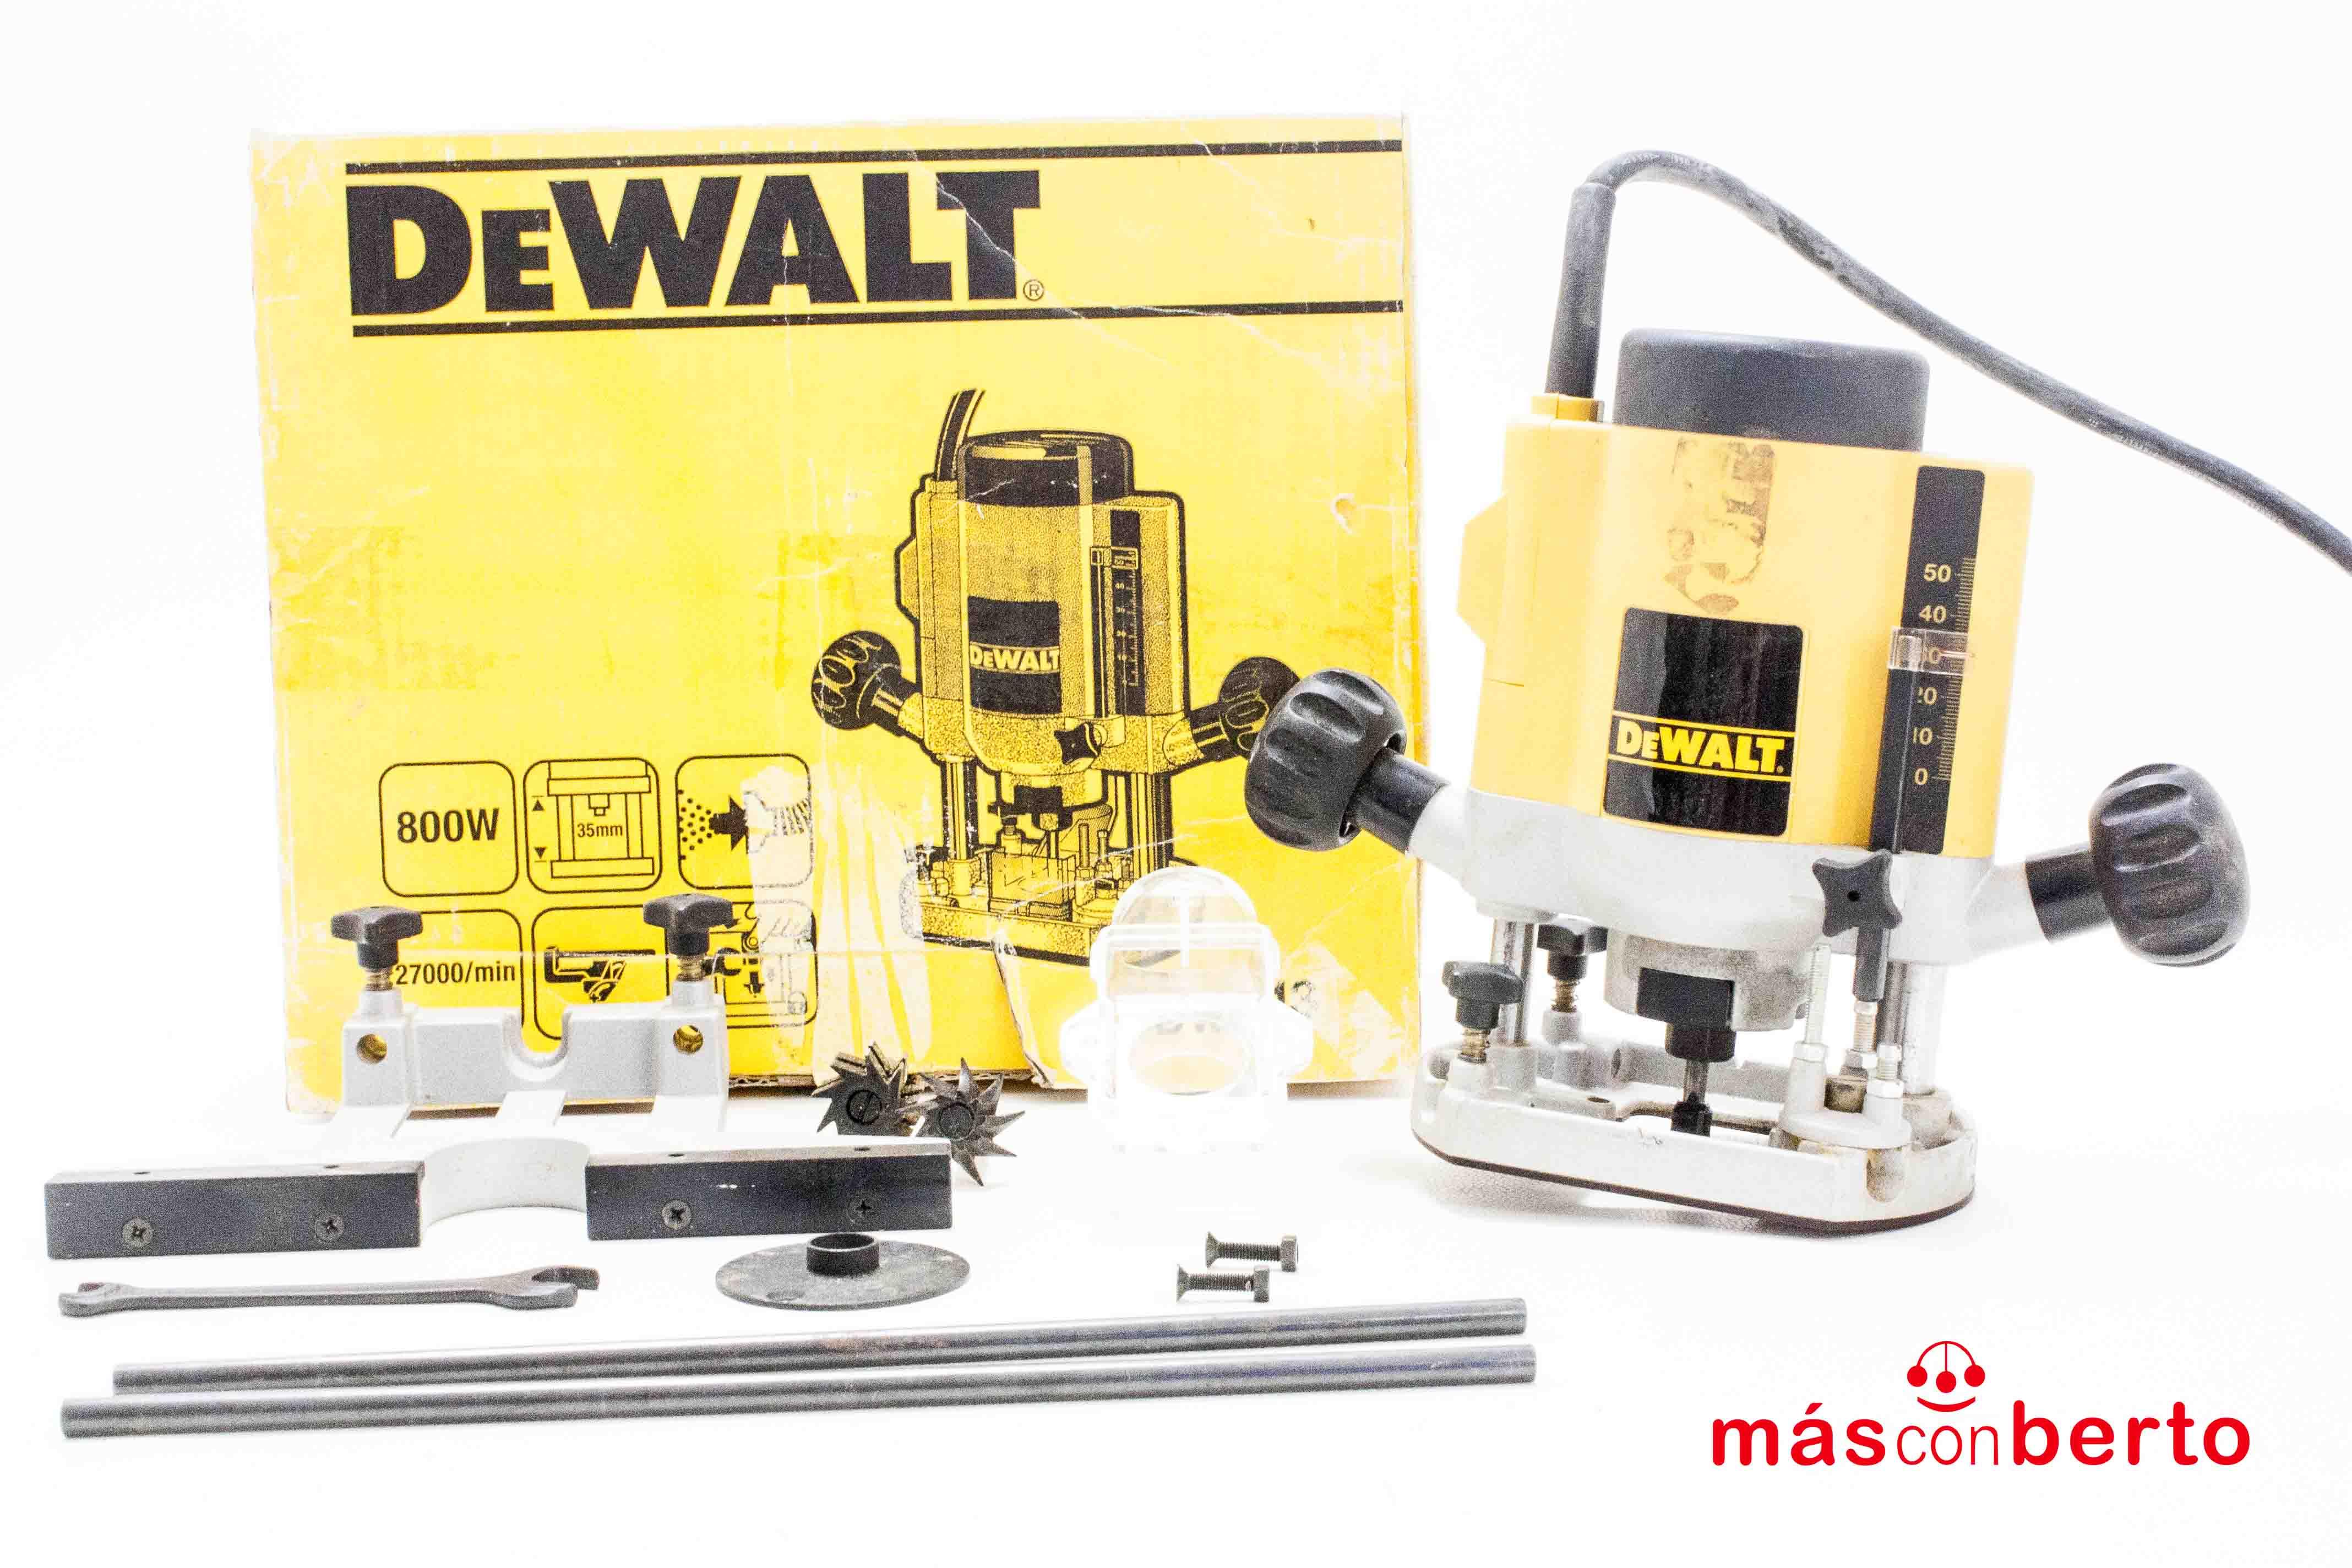 Fresadora DeWALT DW613 800W